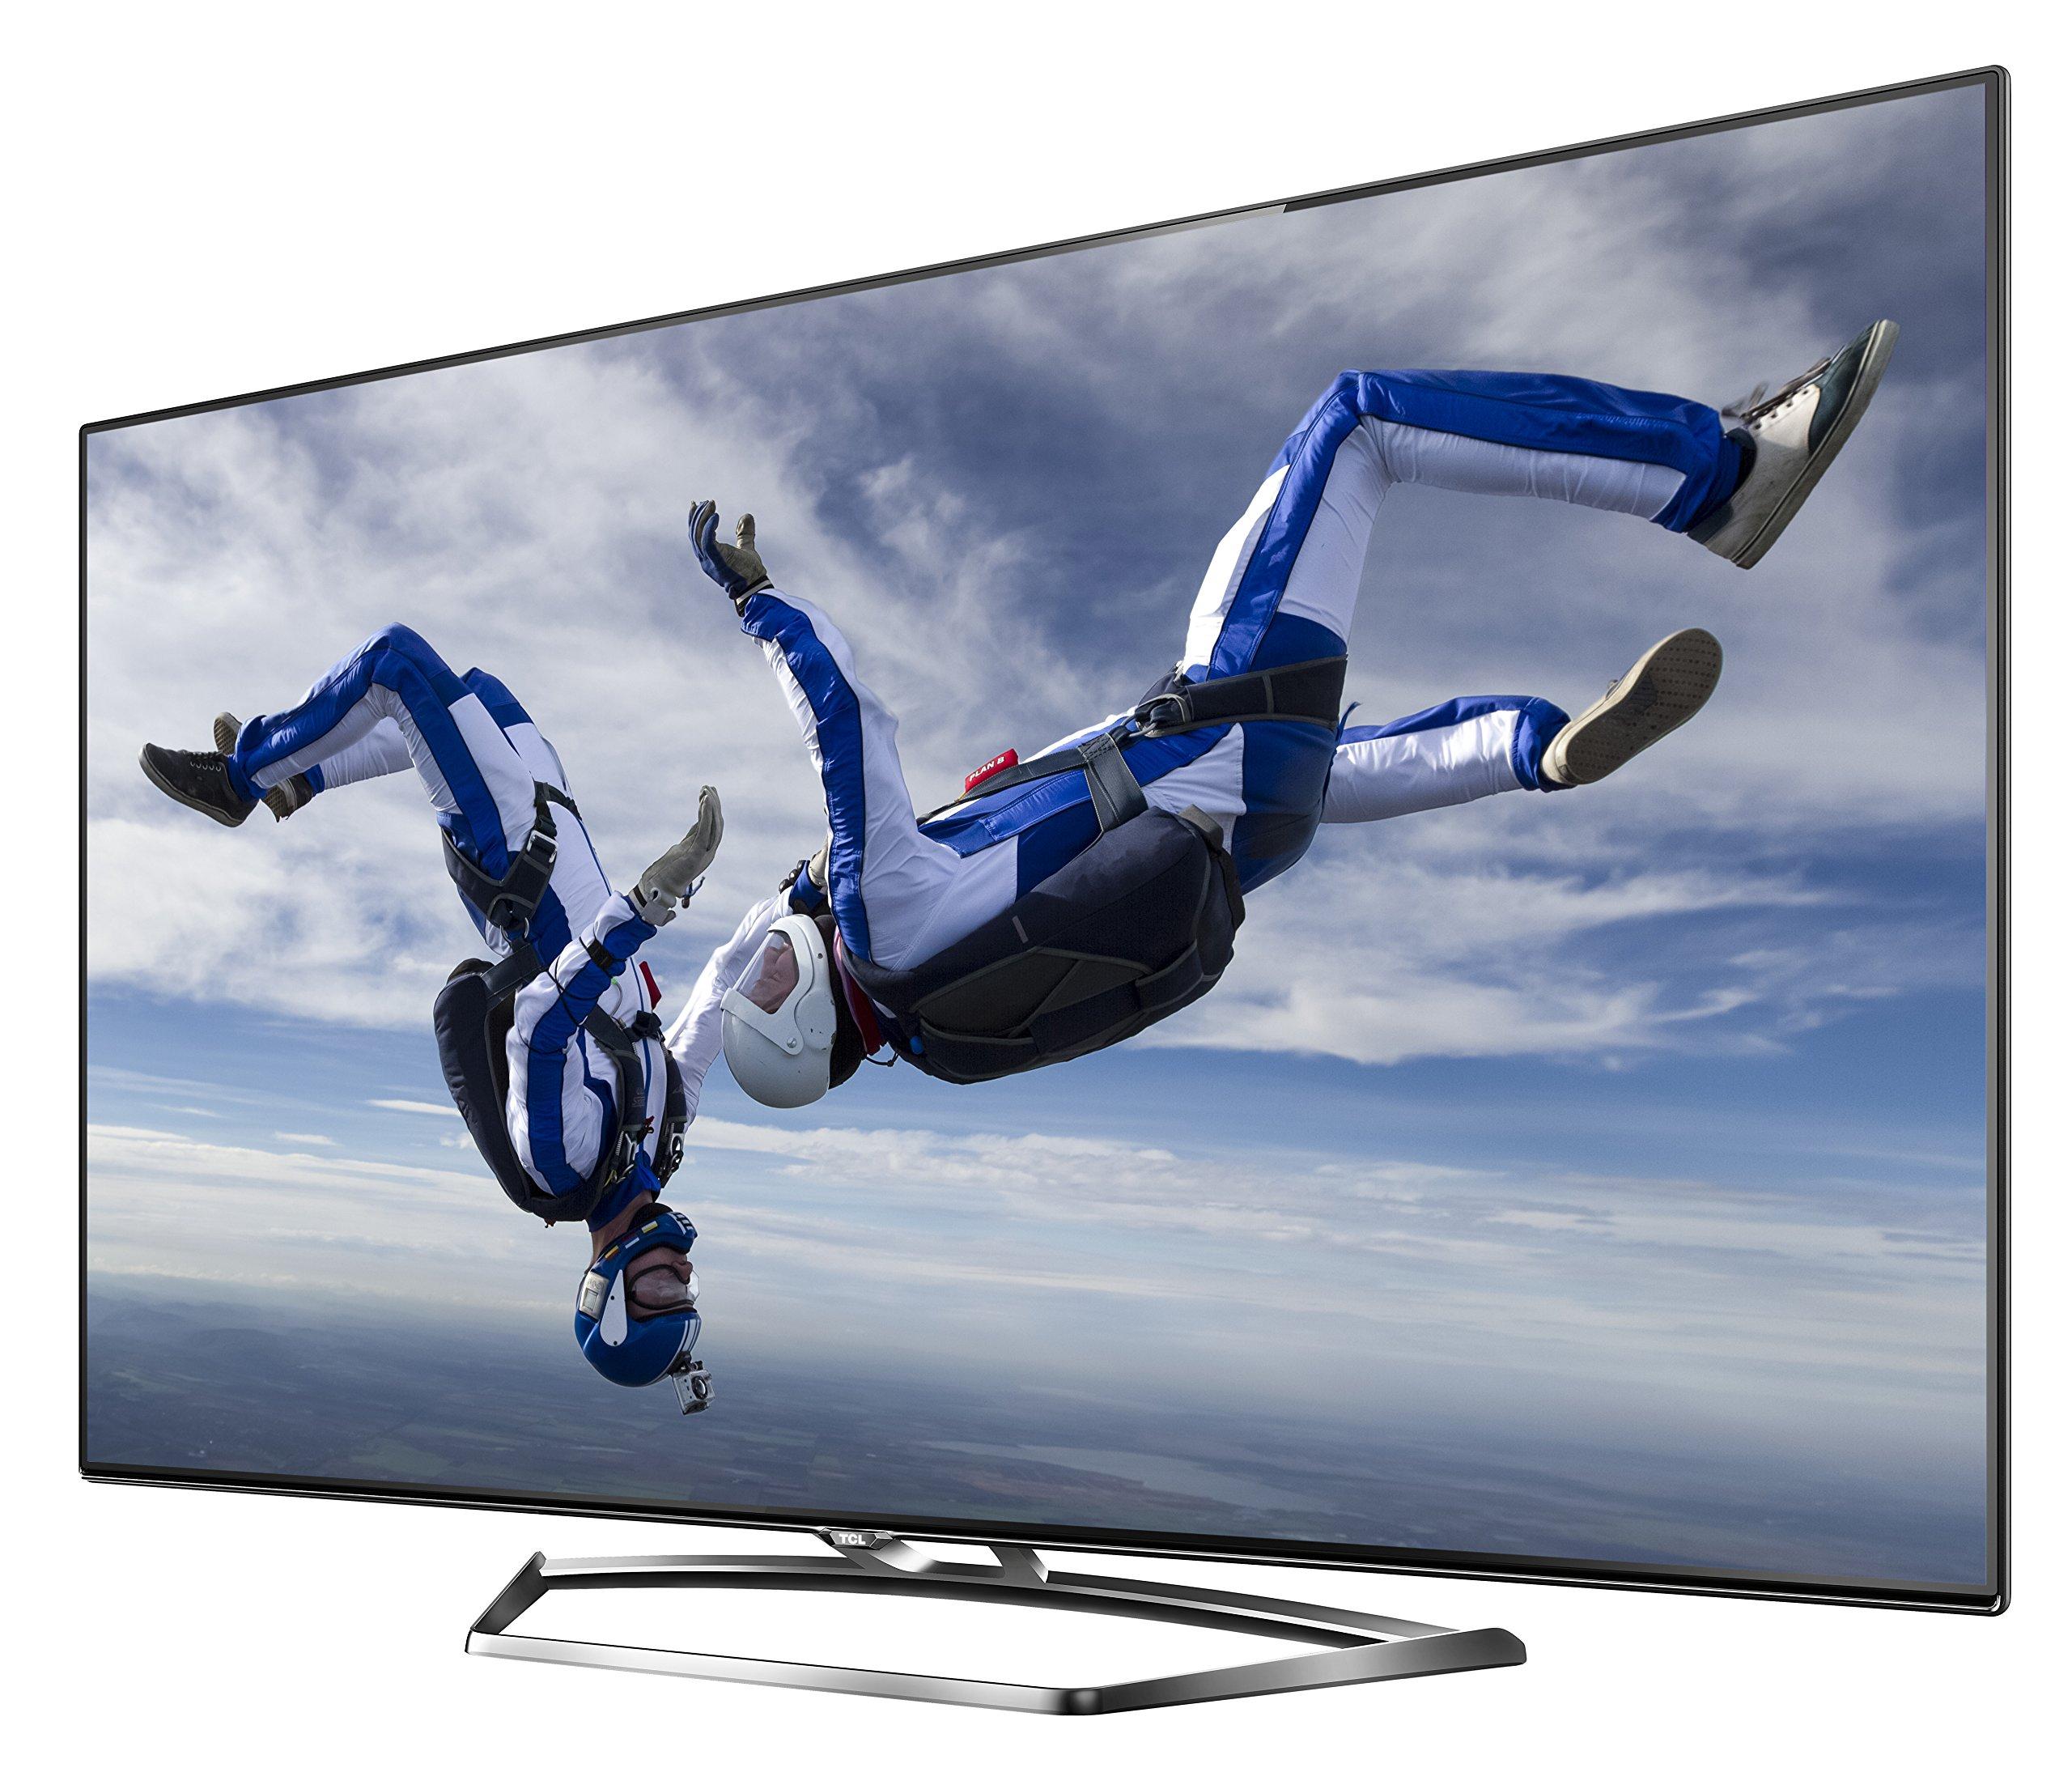 S7 Serie 4K Ultra HD Fernseher U49S7606DS: Amazon.es: Electrónica